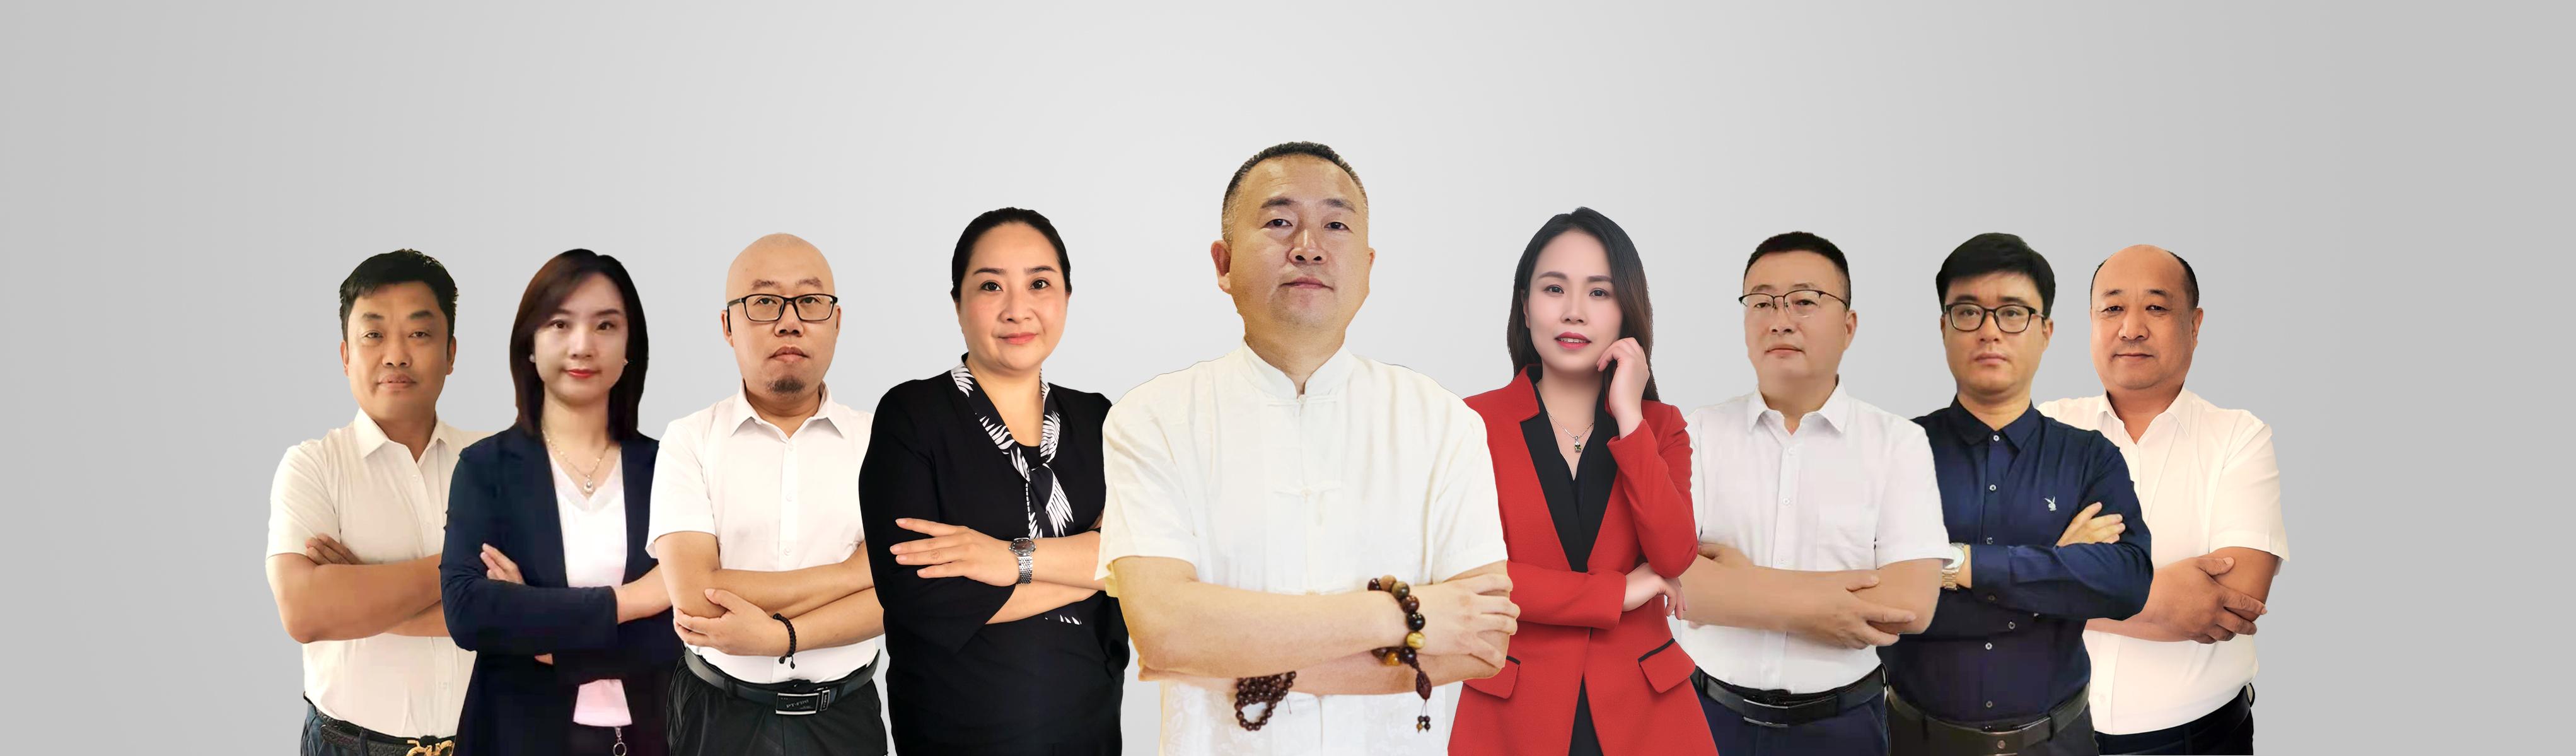 http://img.toumeiw.cn/upload/images/20211011/996ba9034b331745e70c877b59fb7285.jpg